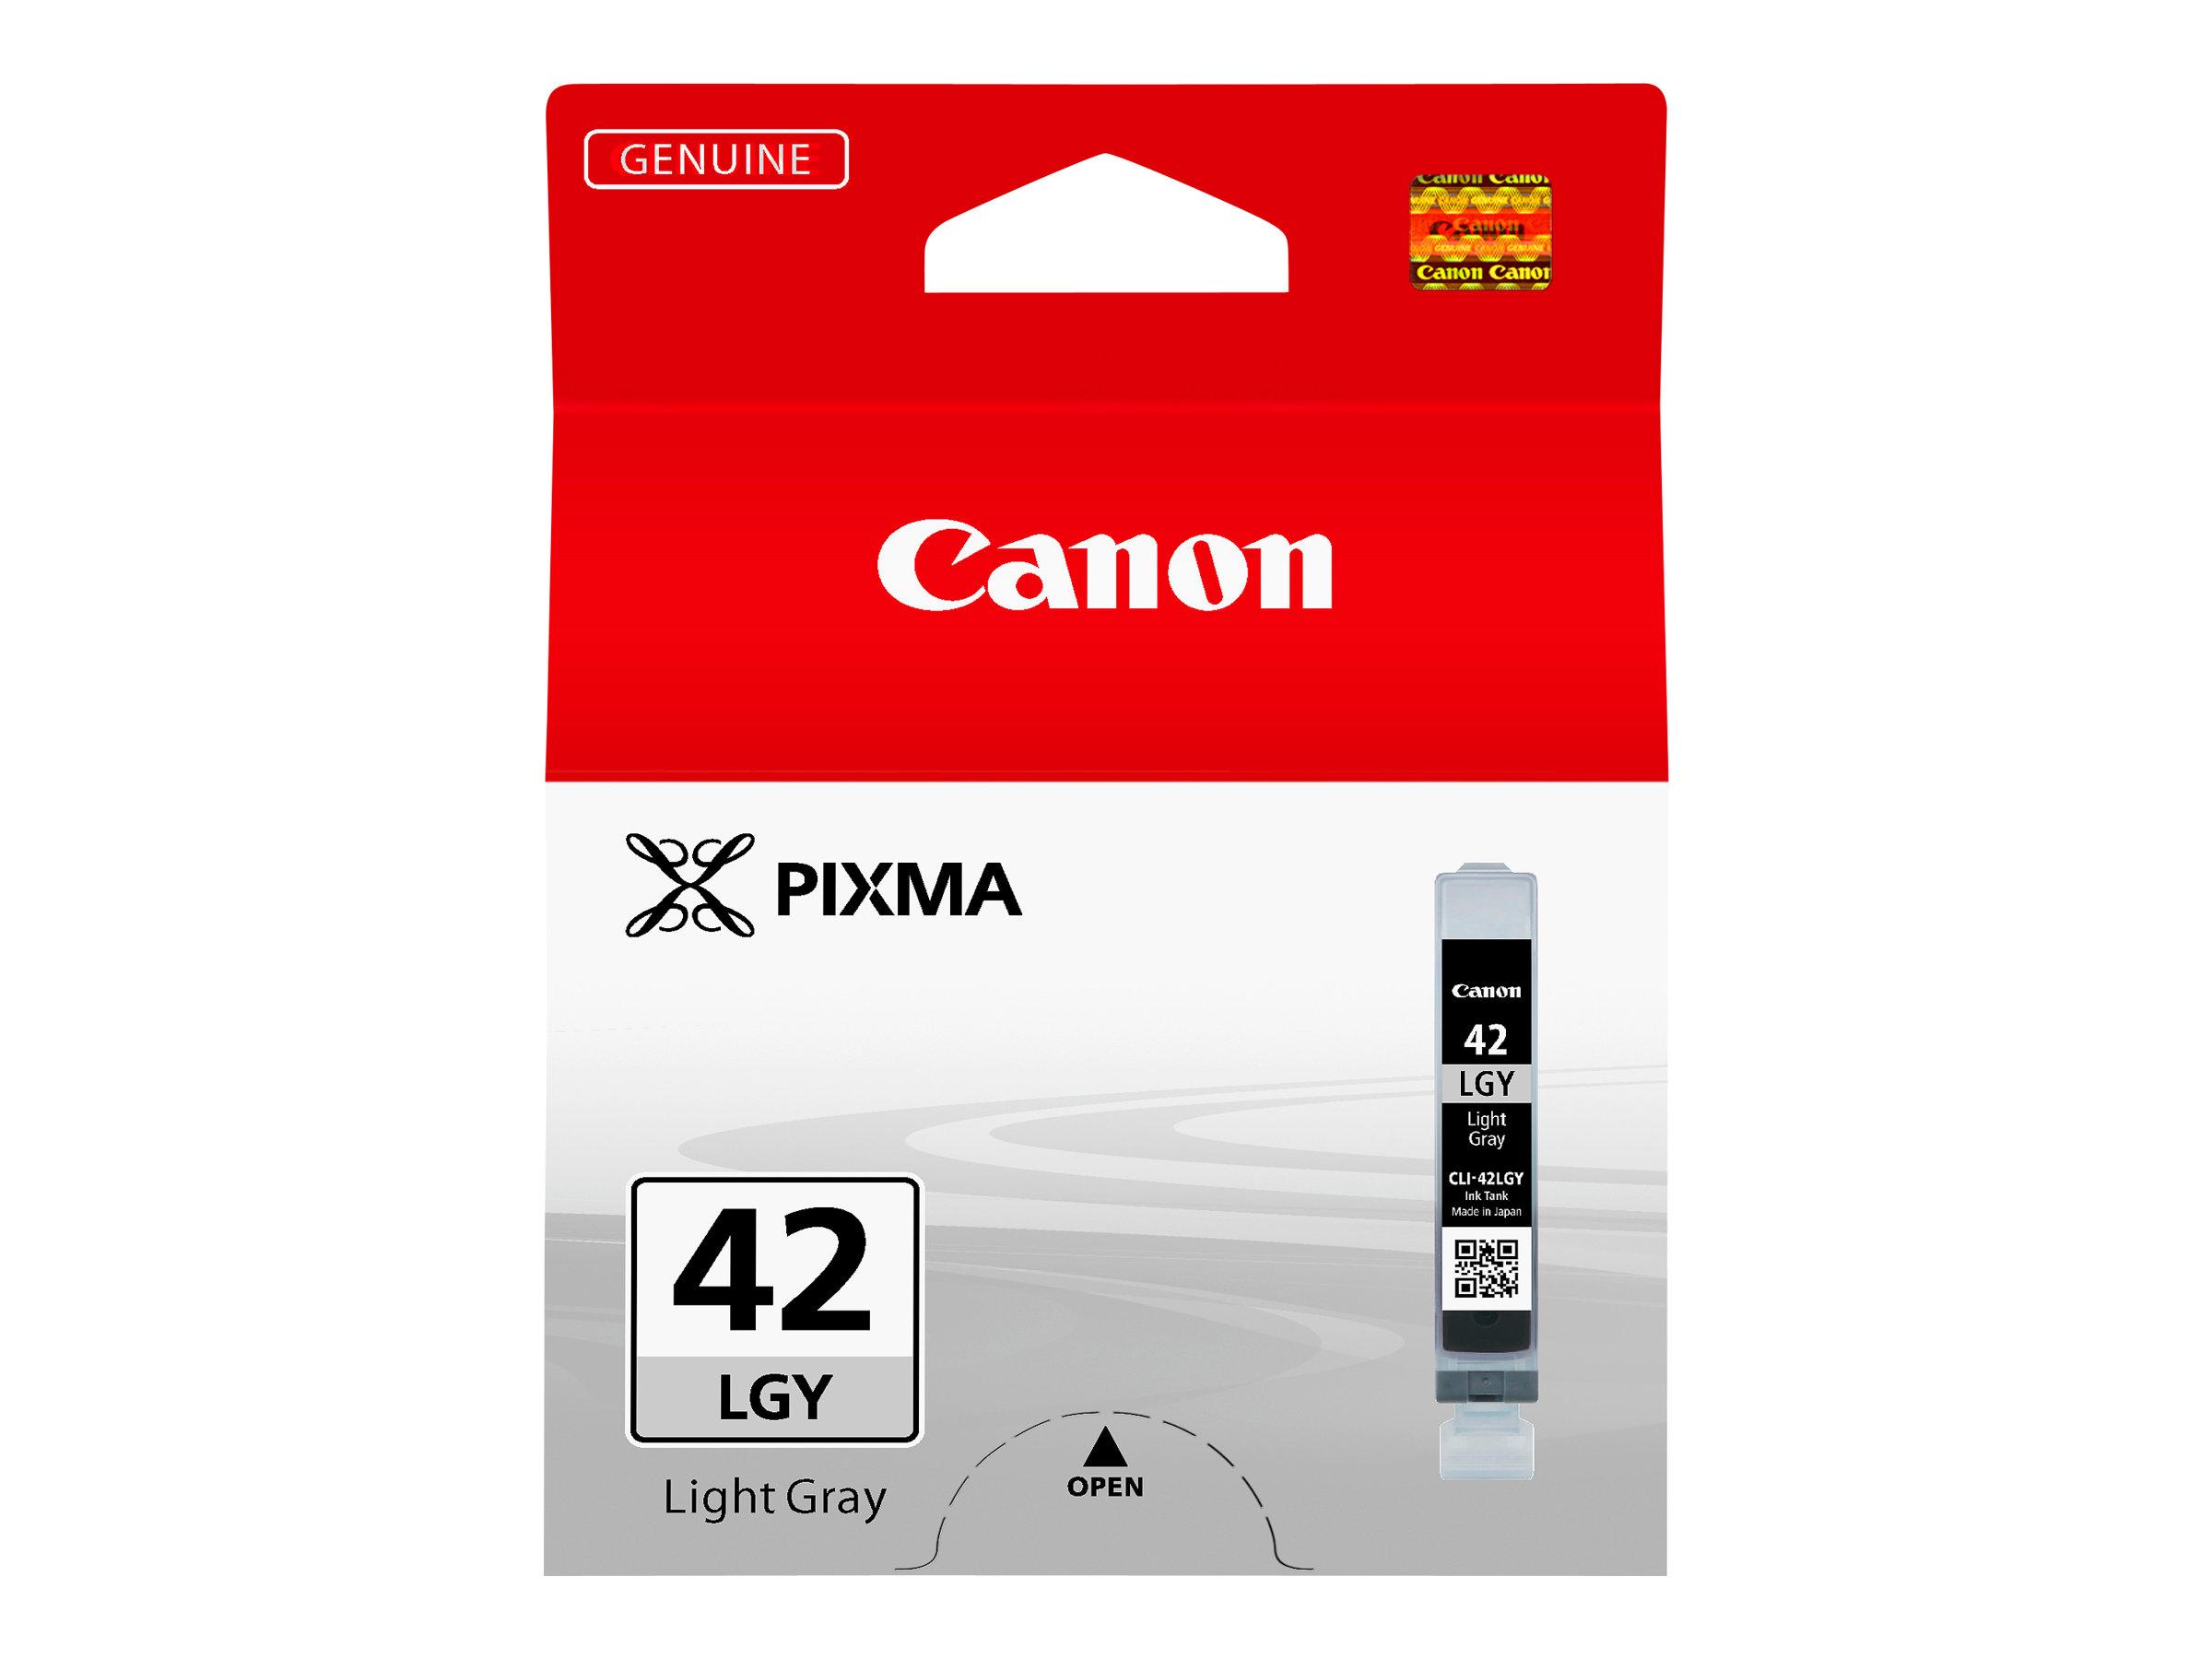 Canon CLI-42LGY - 13 ml - farbstoffbasiertes Hellgrau - Original - Tintenbehälter - für PIXMA PRO-100, PRO-100S; PIXUS PRO-100